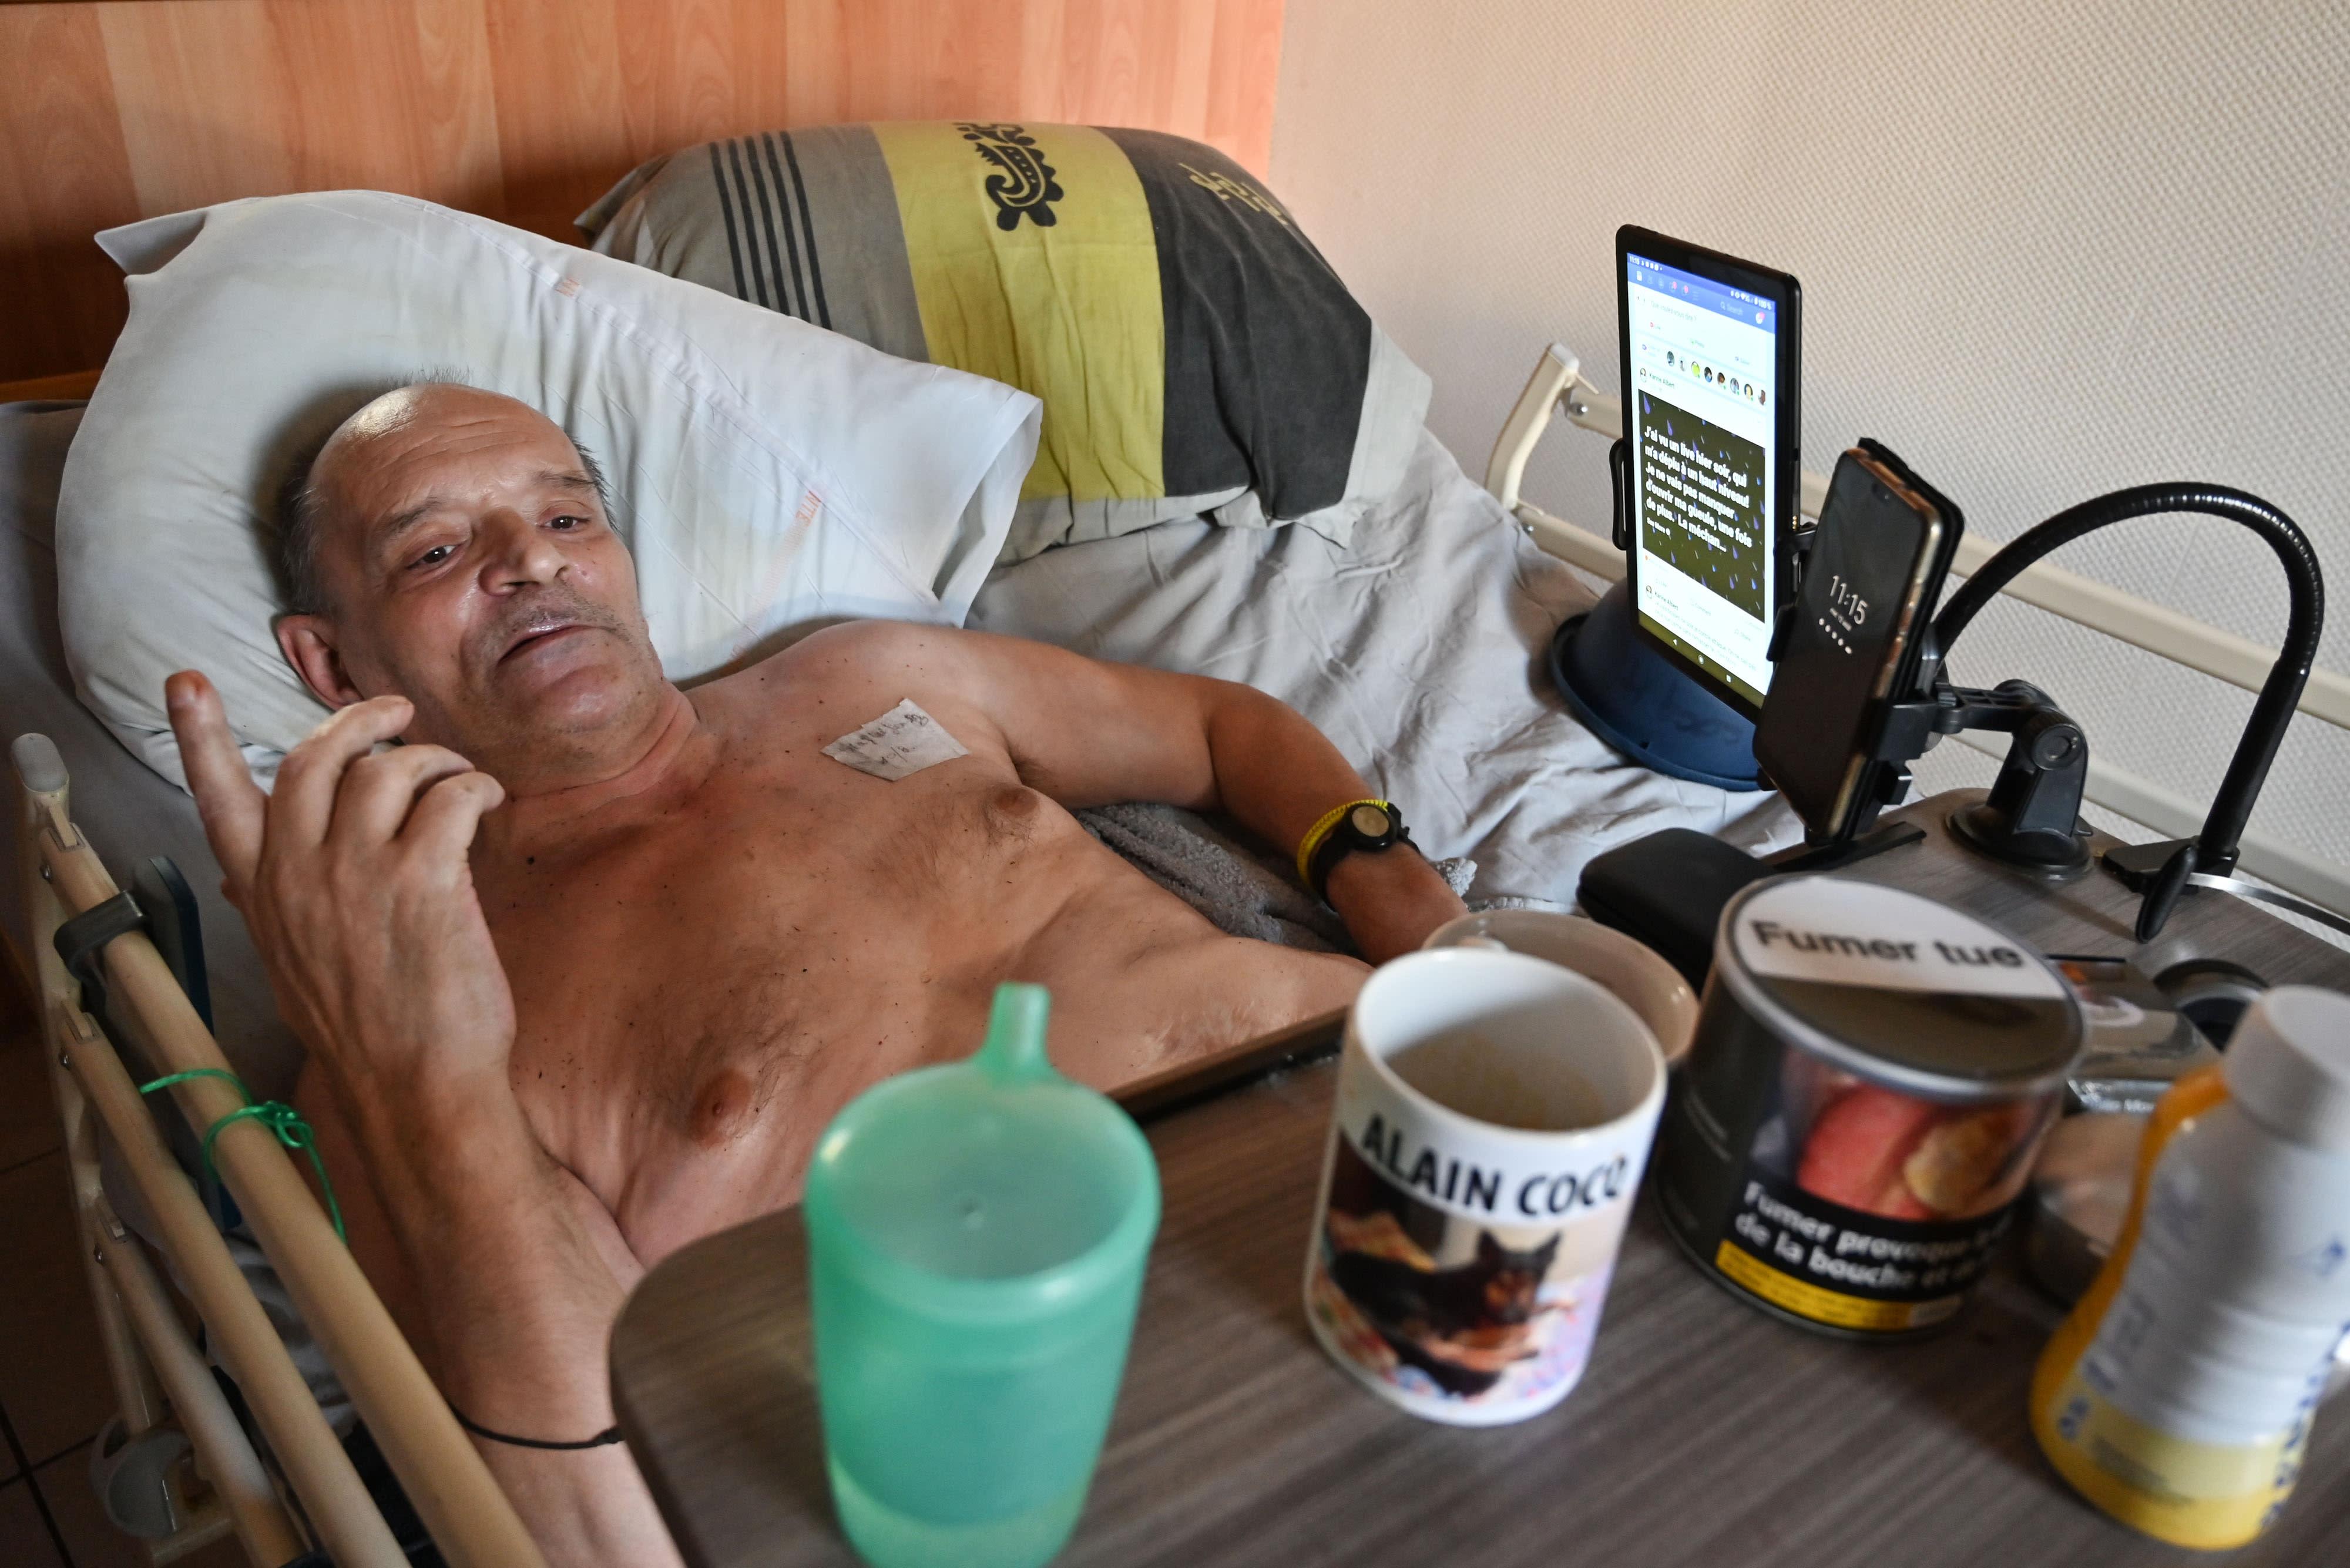 FRANCE-ETHICS-EUTHANASIA-DEATH-HEALTH-DISABLED